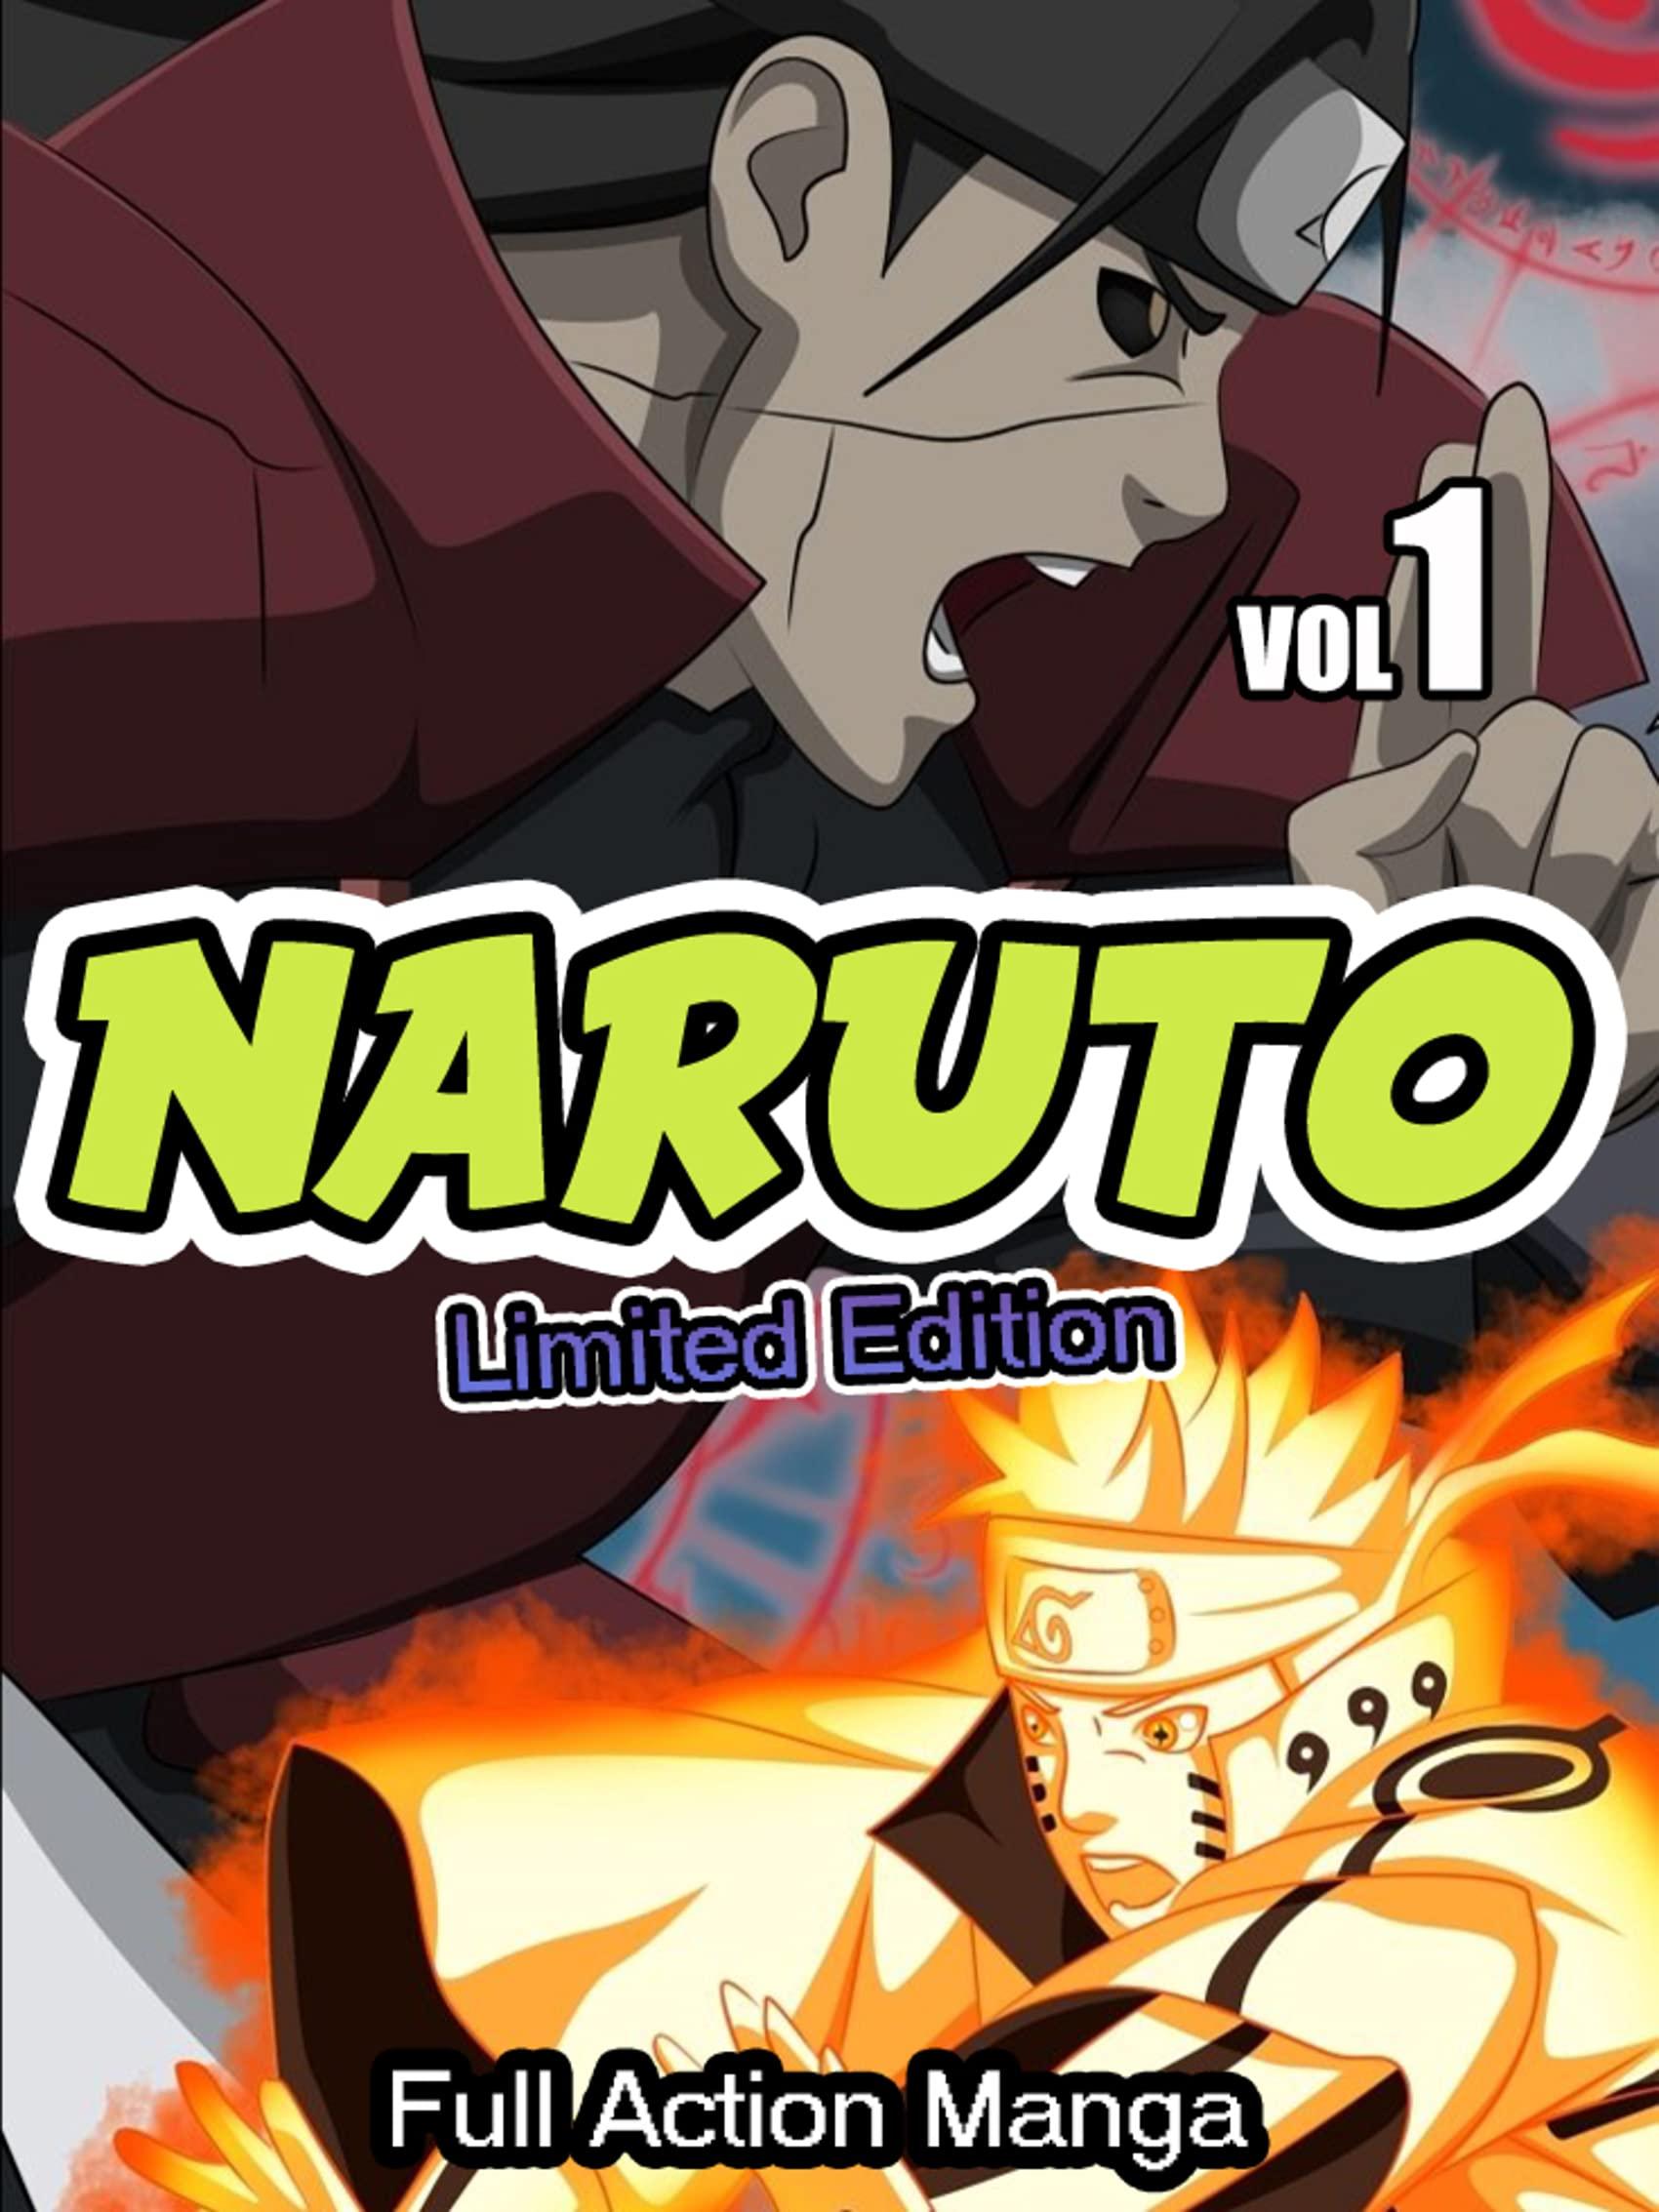 Full Action Manga Naruto Complete Series: Limited Edition Naruto Vol 1